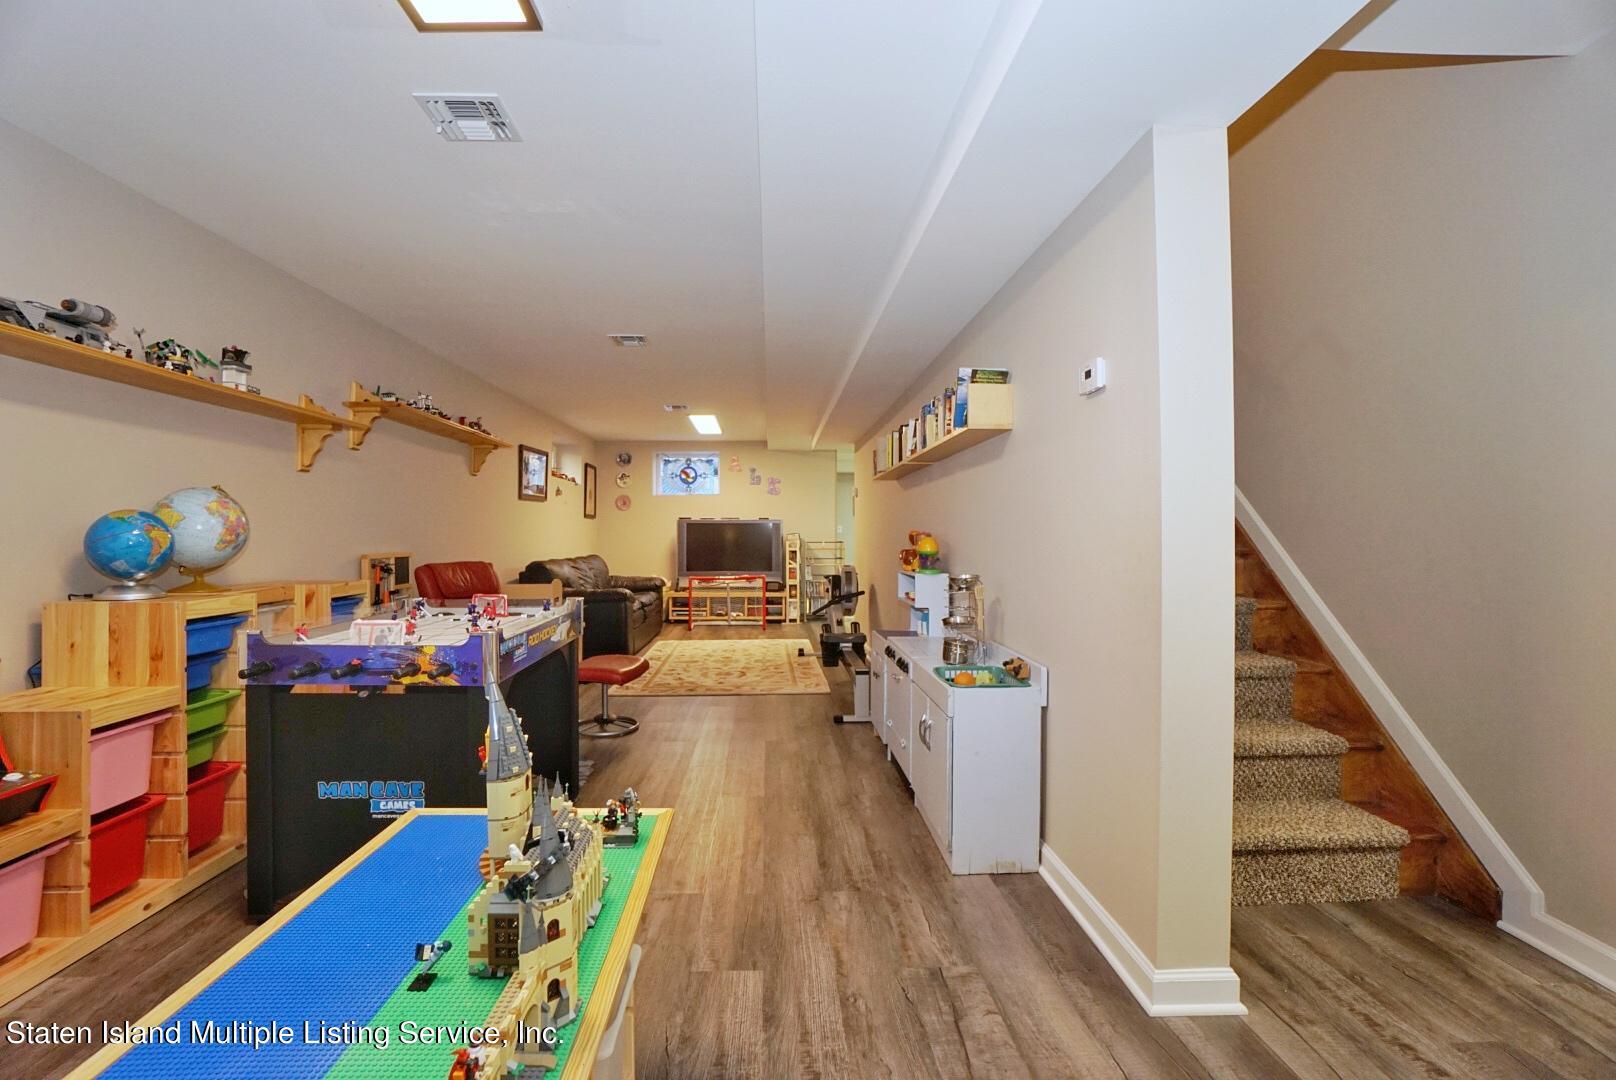 Single Family - Detached 31 Belwood Loop  Staten Island, NY 10307, MLS-1143133-50